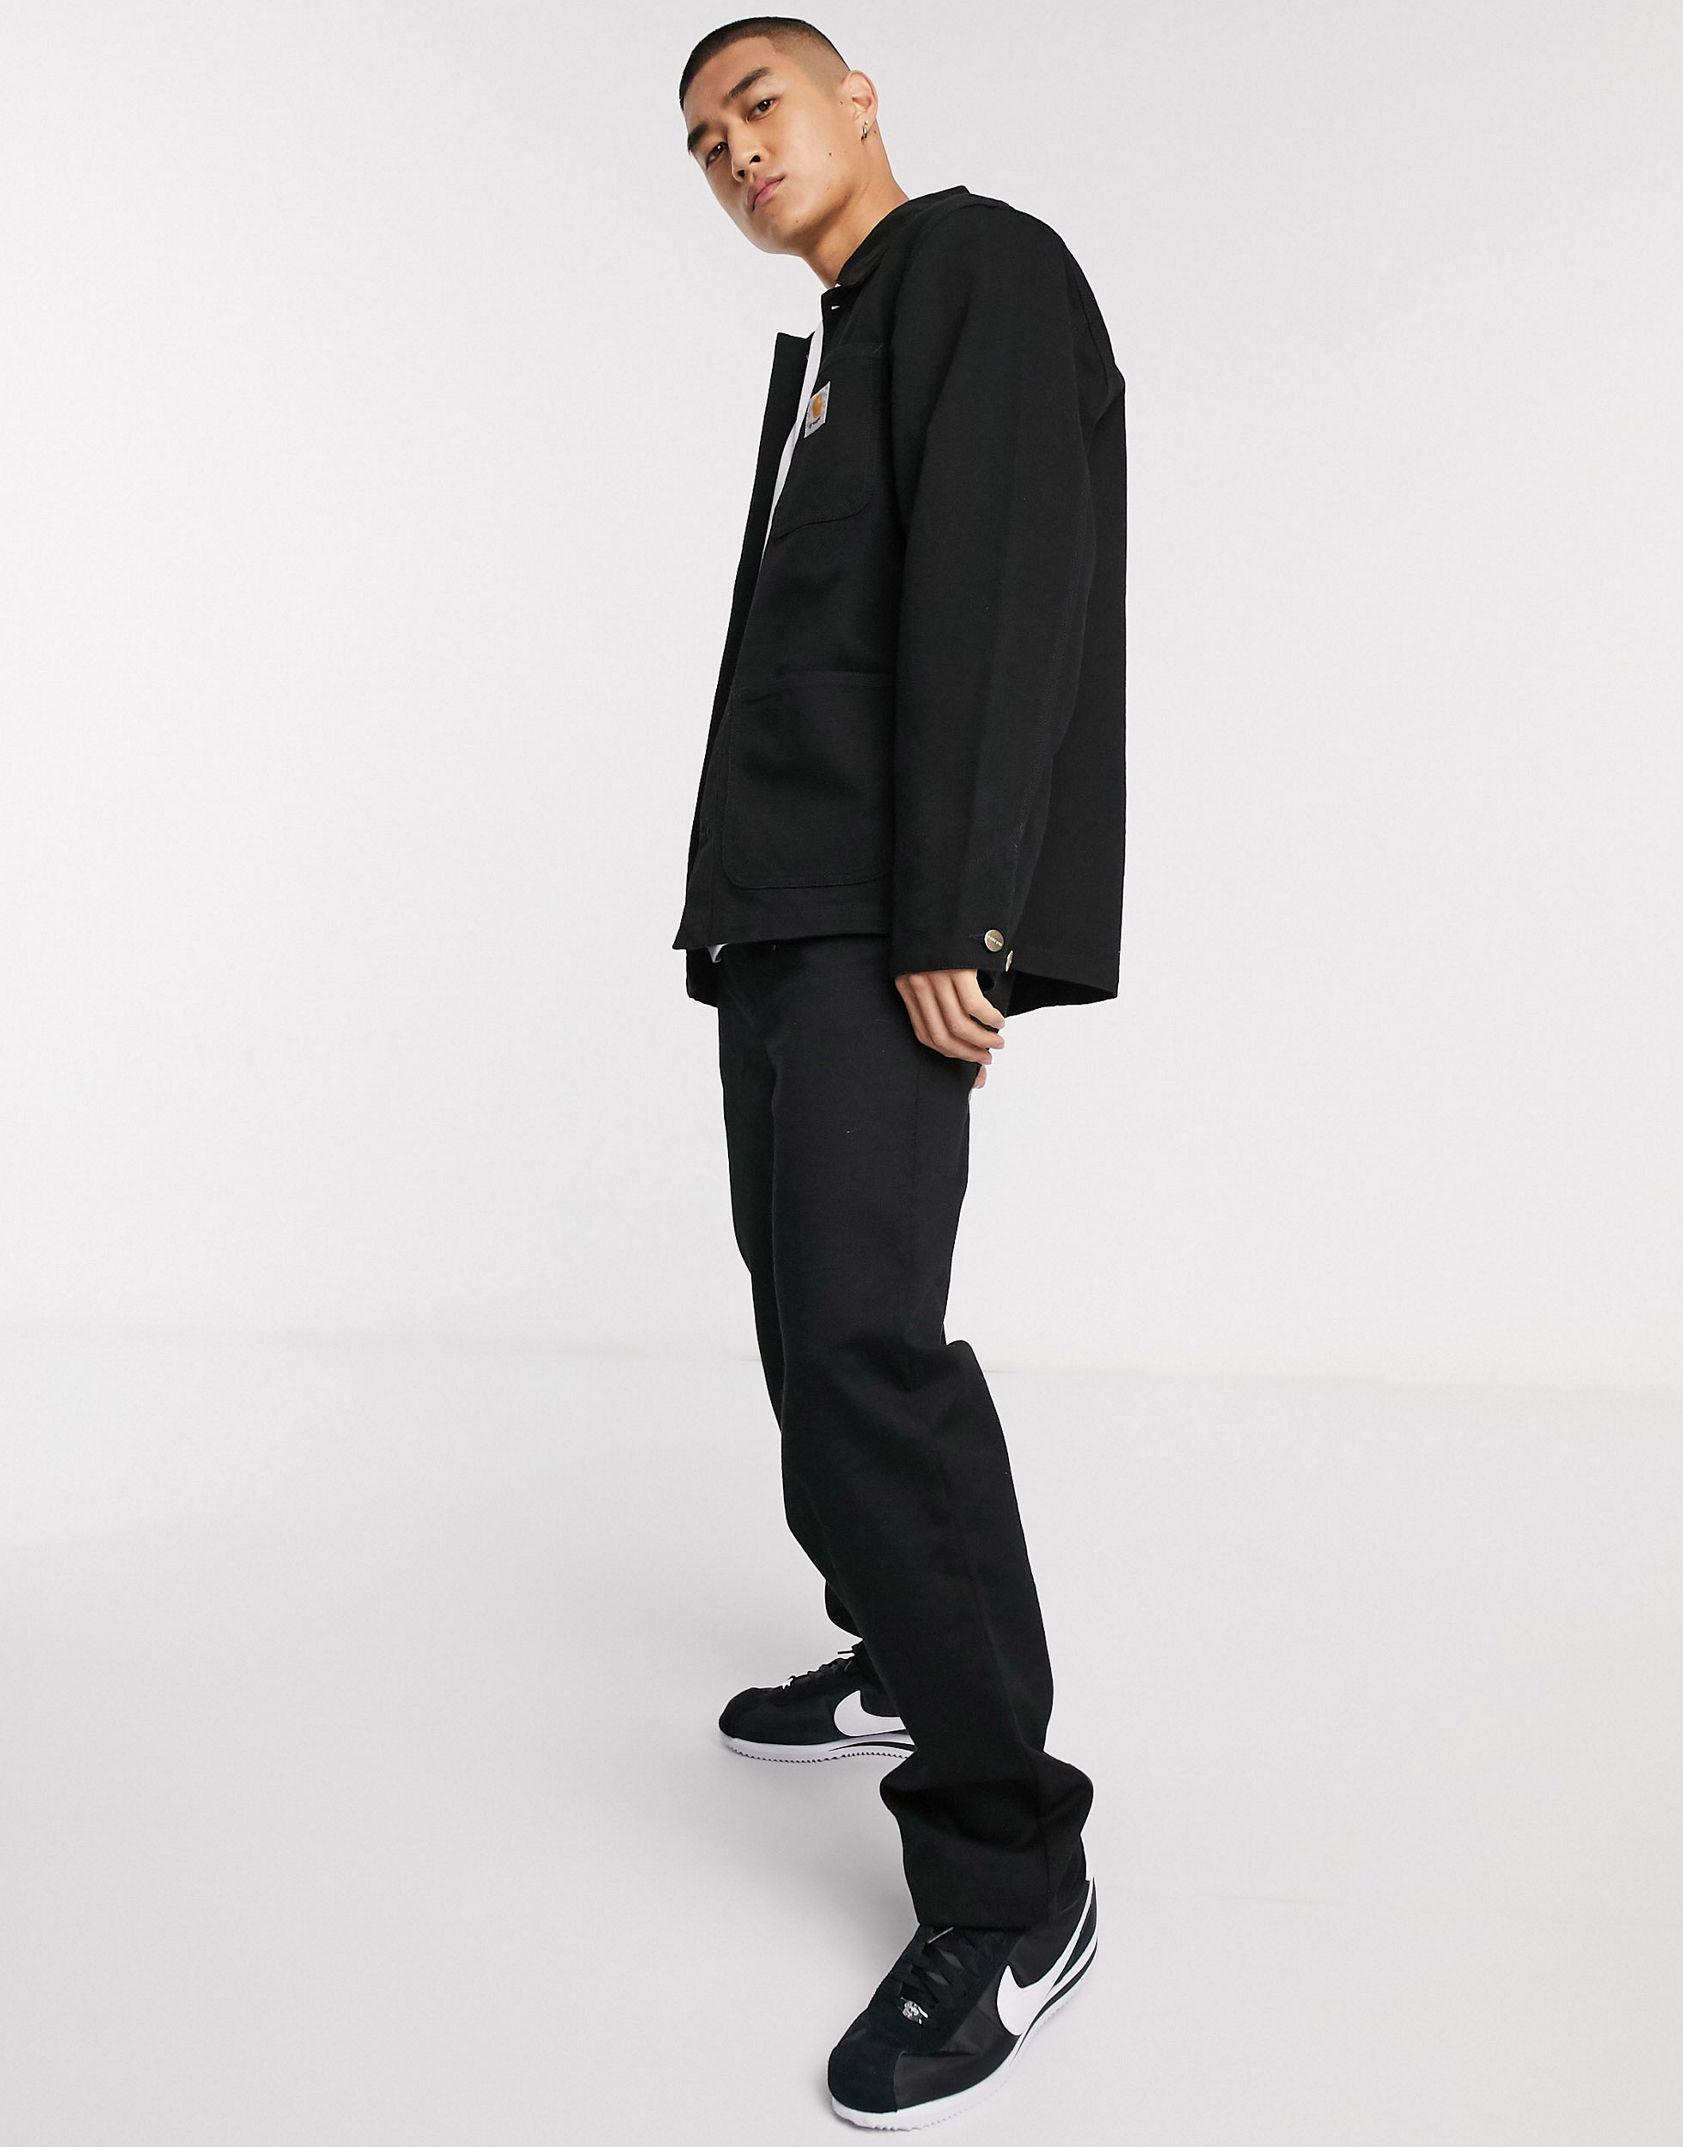 Carhartt WIP Michigan summer coat in black -  Price Checker